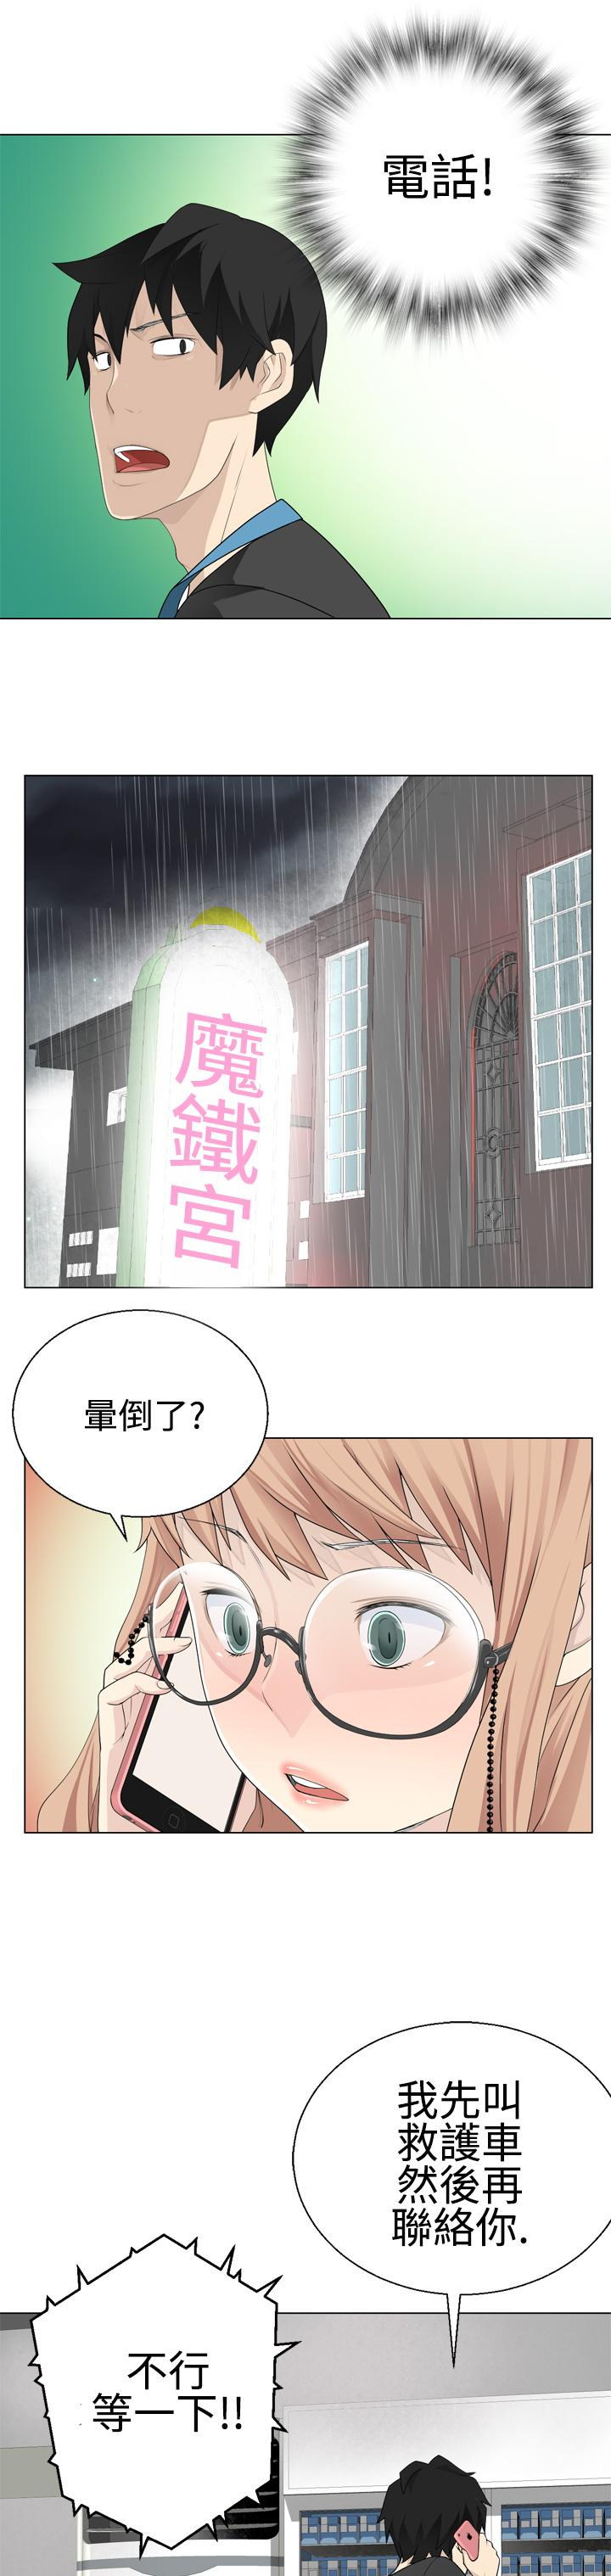 [SOSO] Franken Jo 为爱而生 法兰克赵 Ch.1~19 [Chinese]中文 214